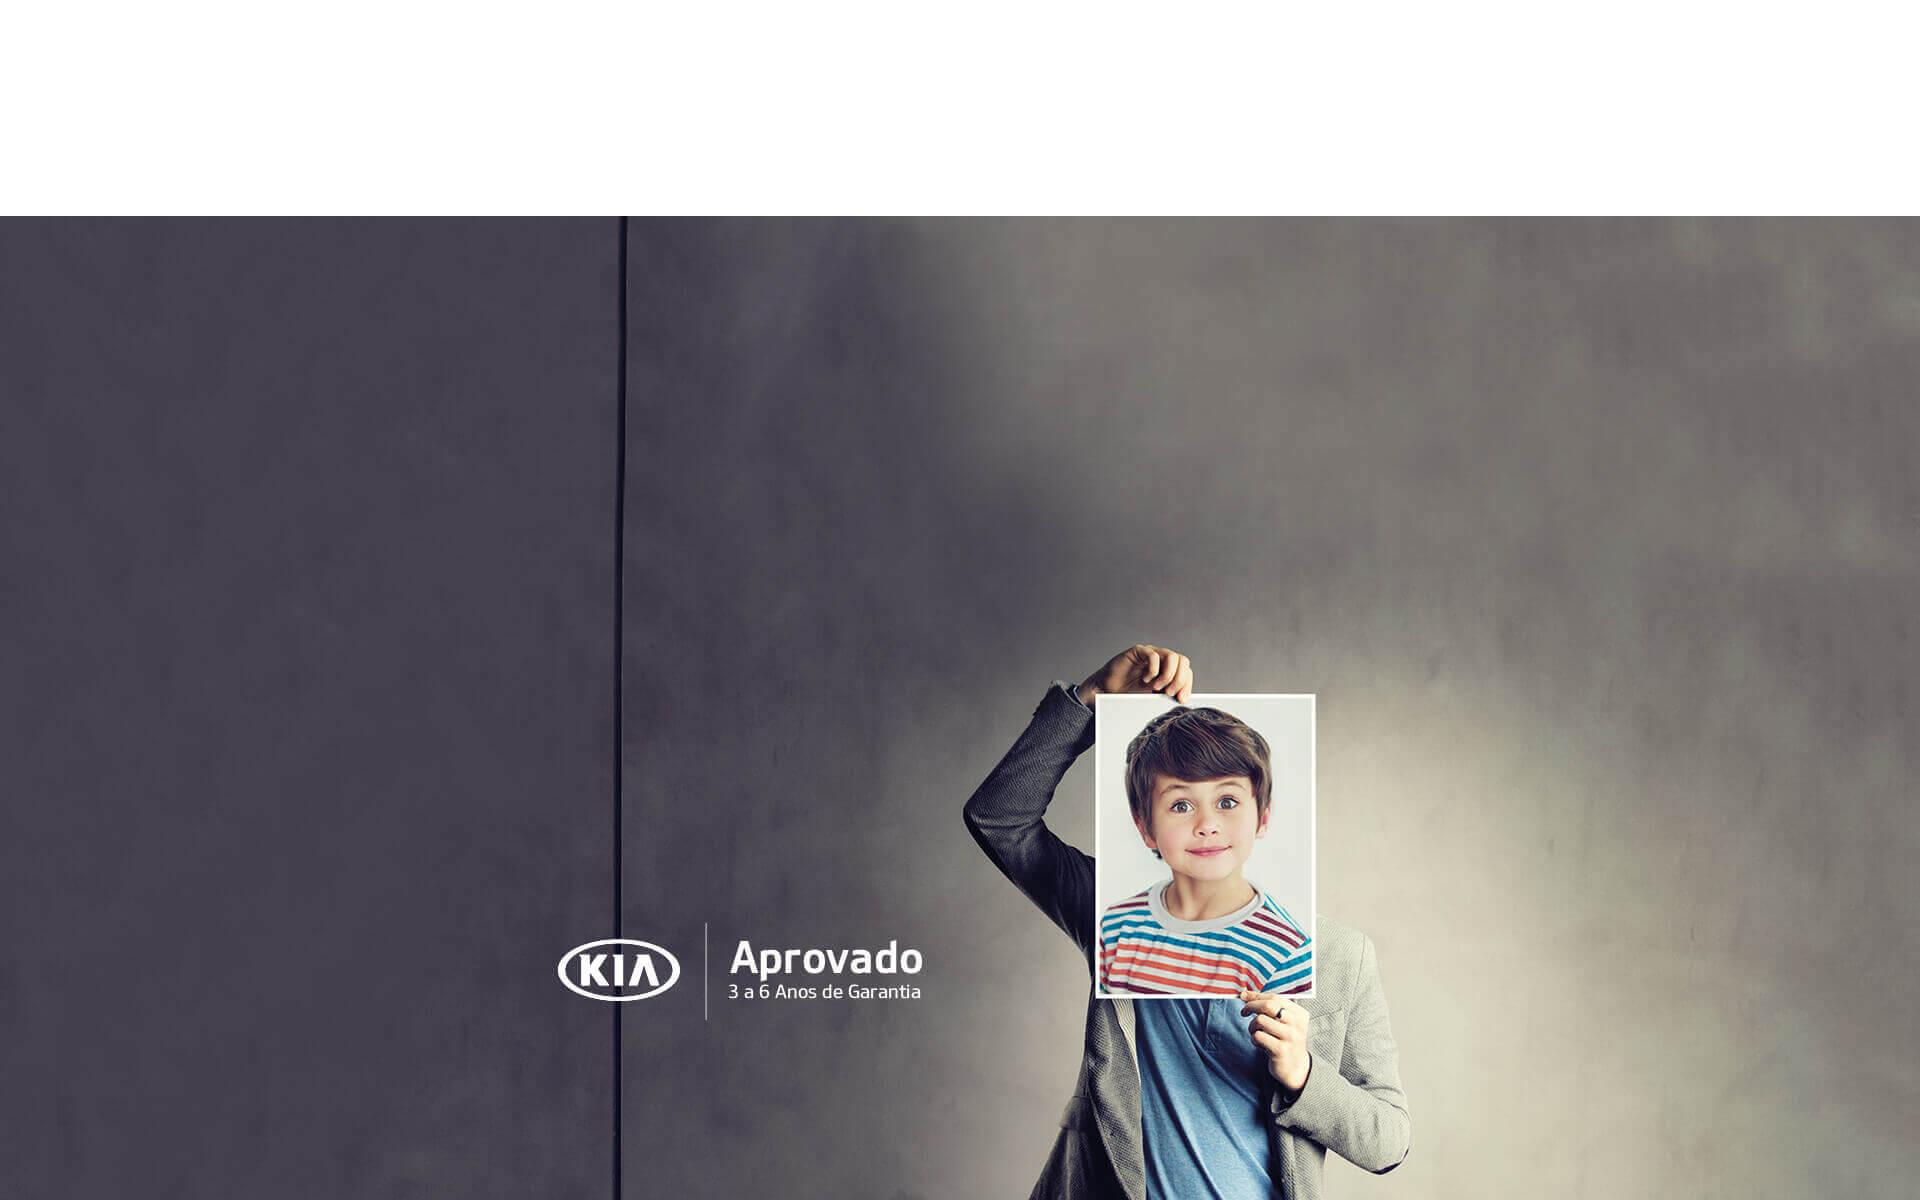 Kia Portugal